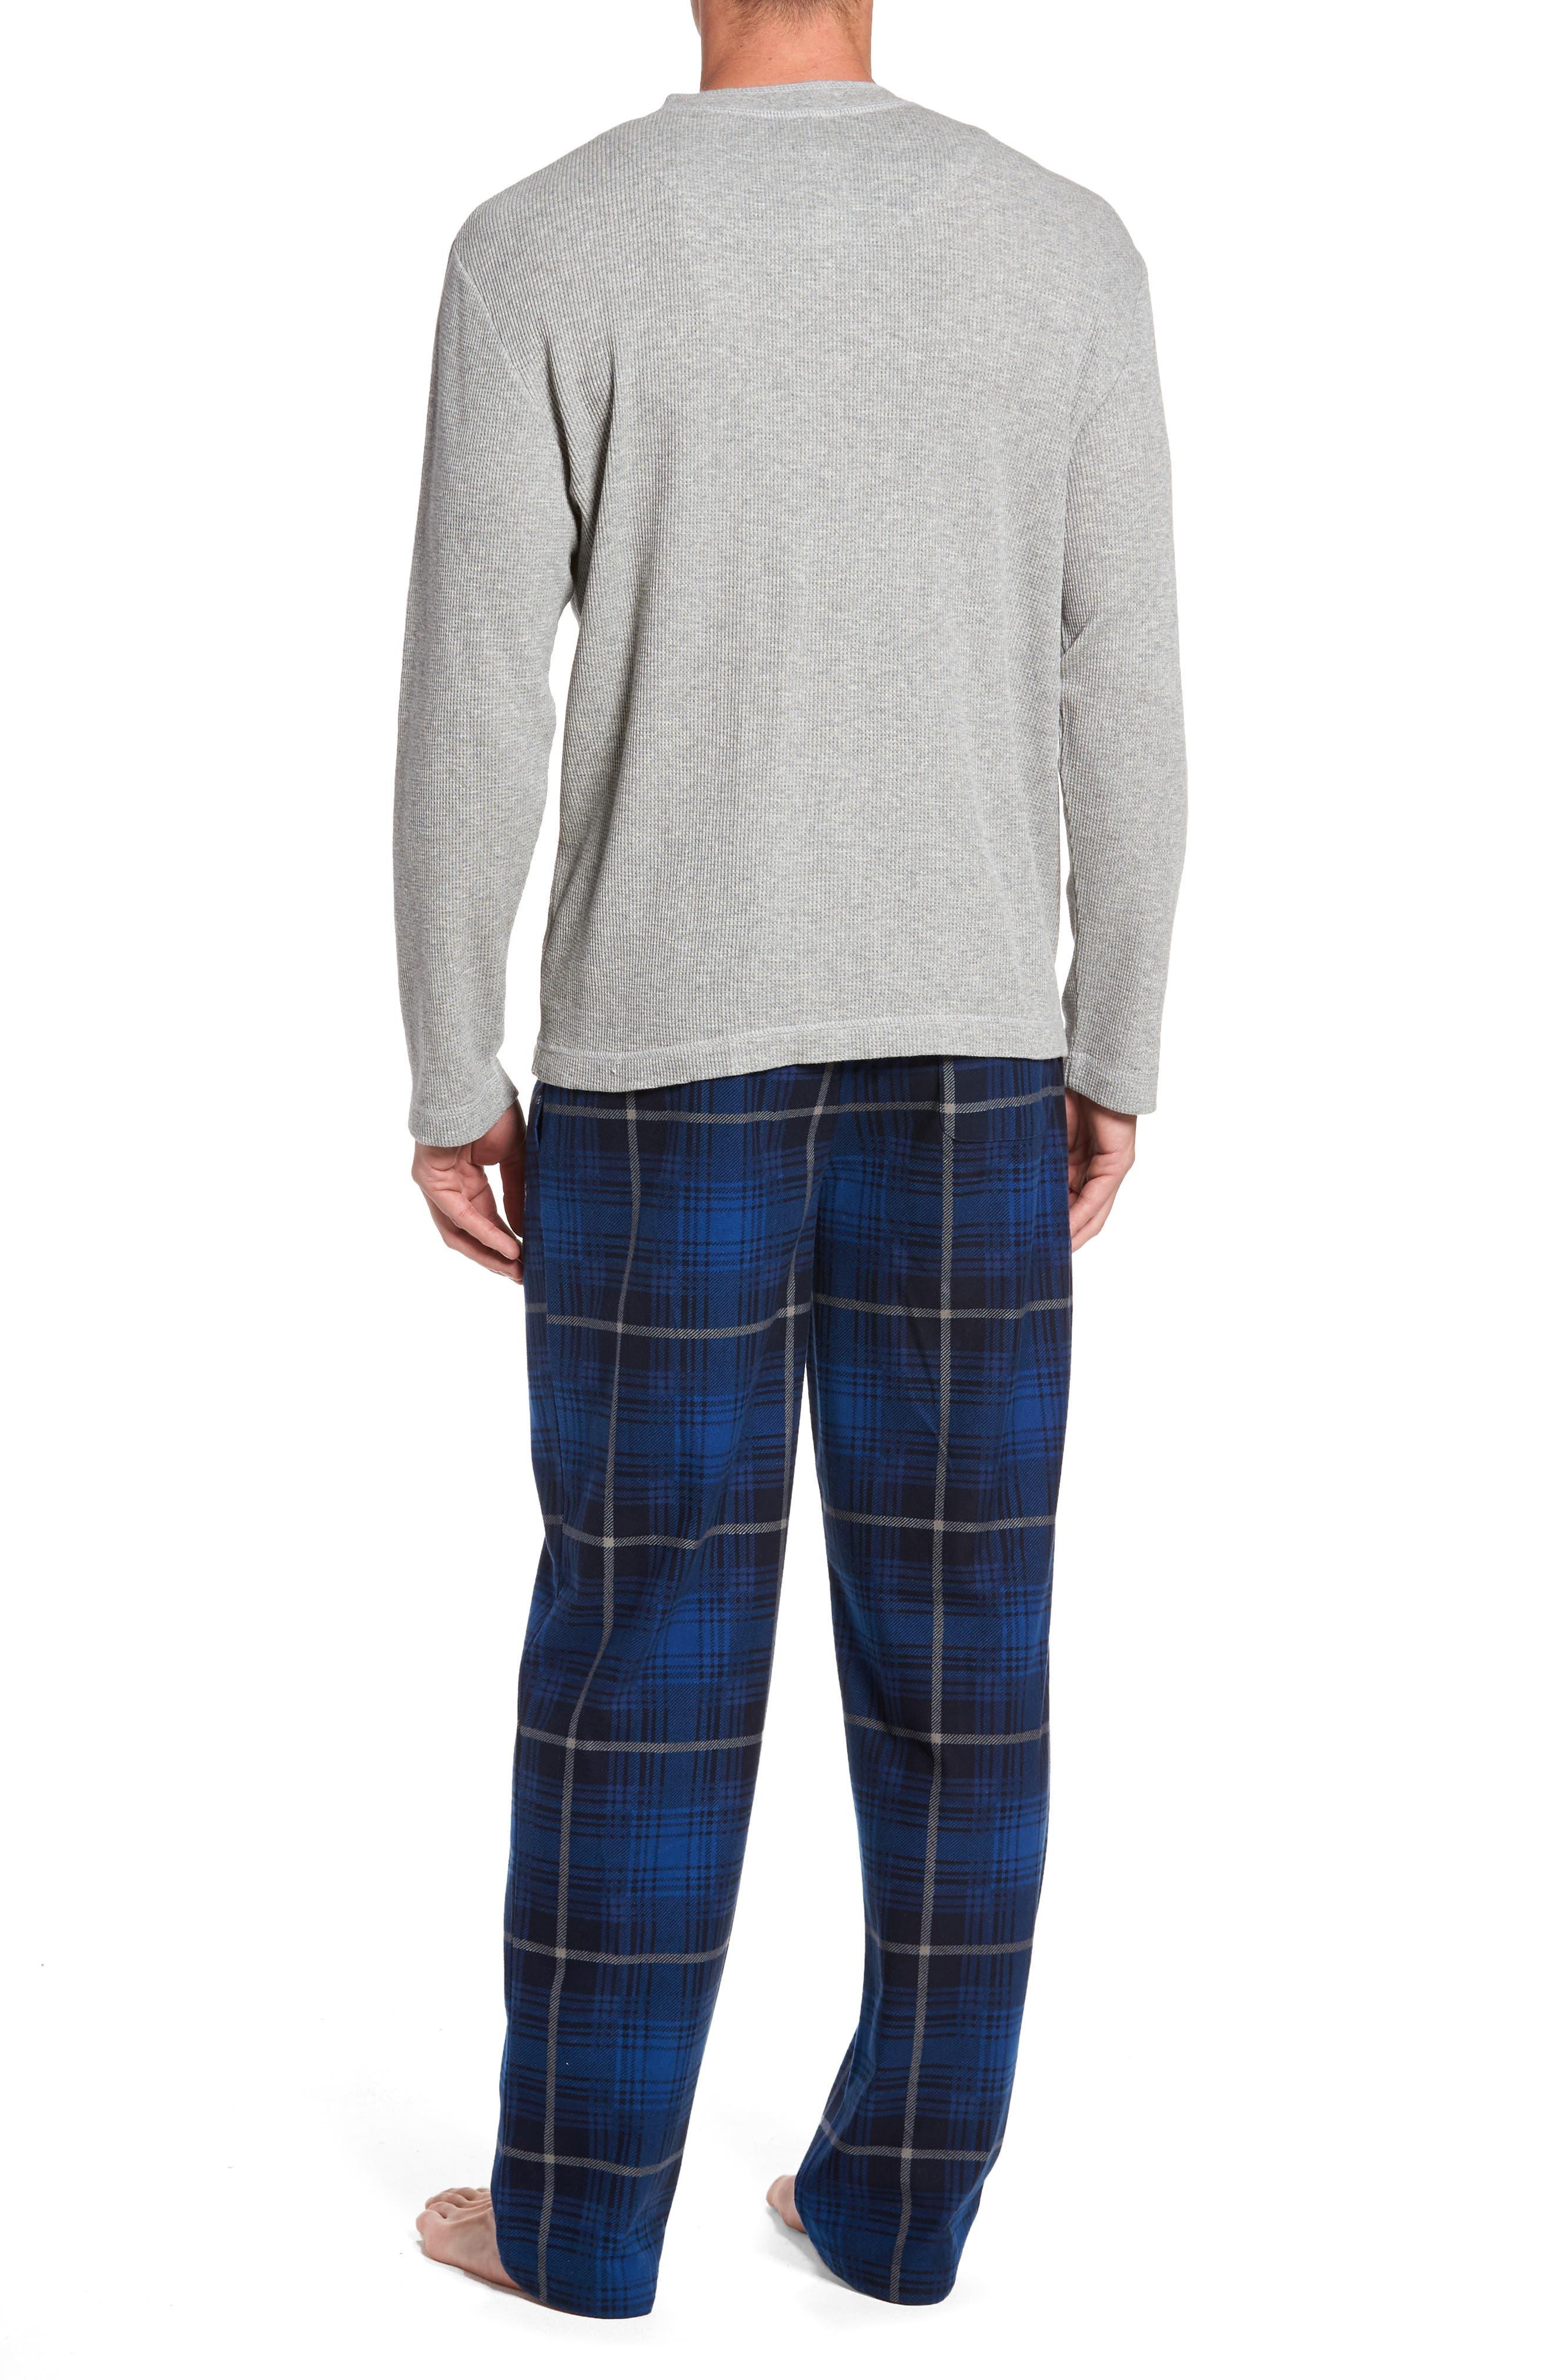 Alternate Image 2  - Majestic International Nifty Gift Henley Shirt & Lounge Pants